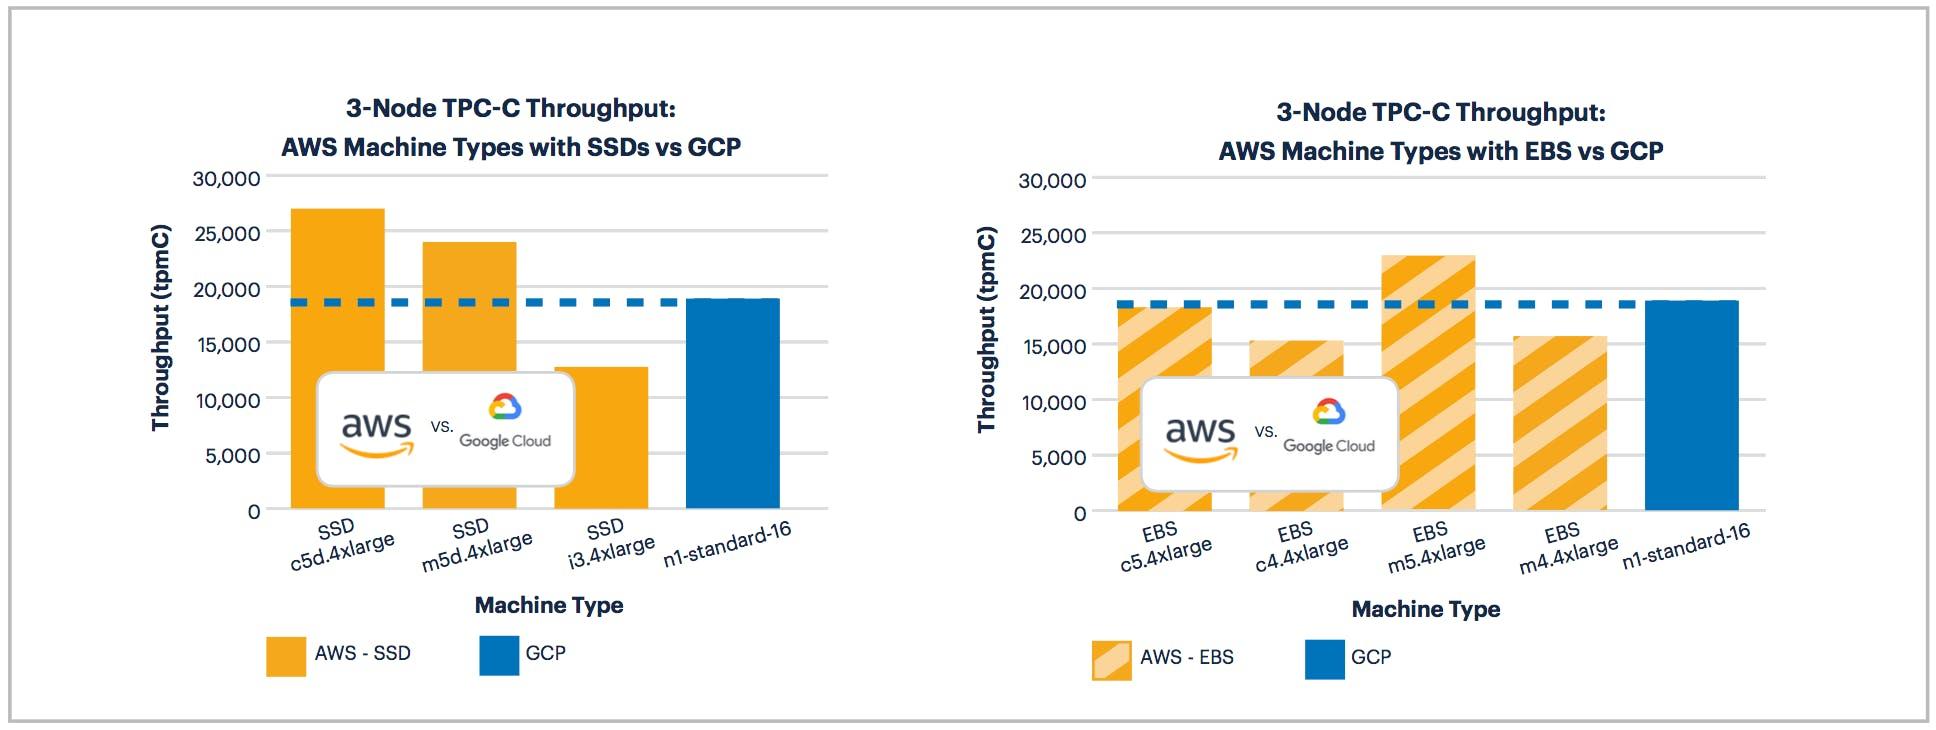 AWS vs GCP: 3-Node TPC-C Performance on SSD and EBS Machines